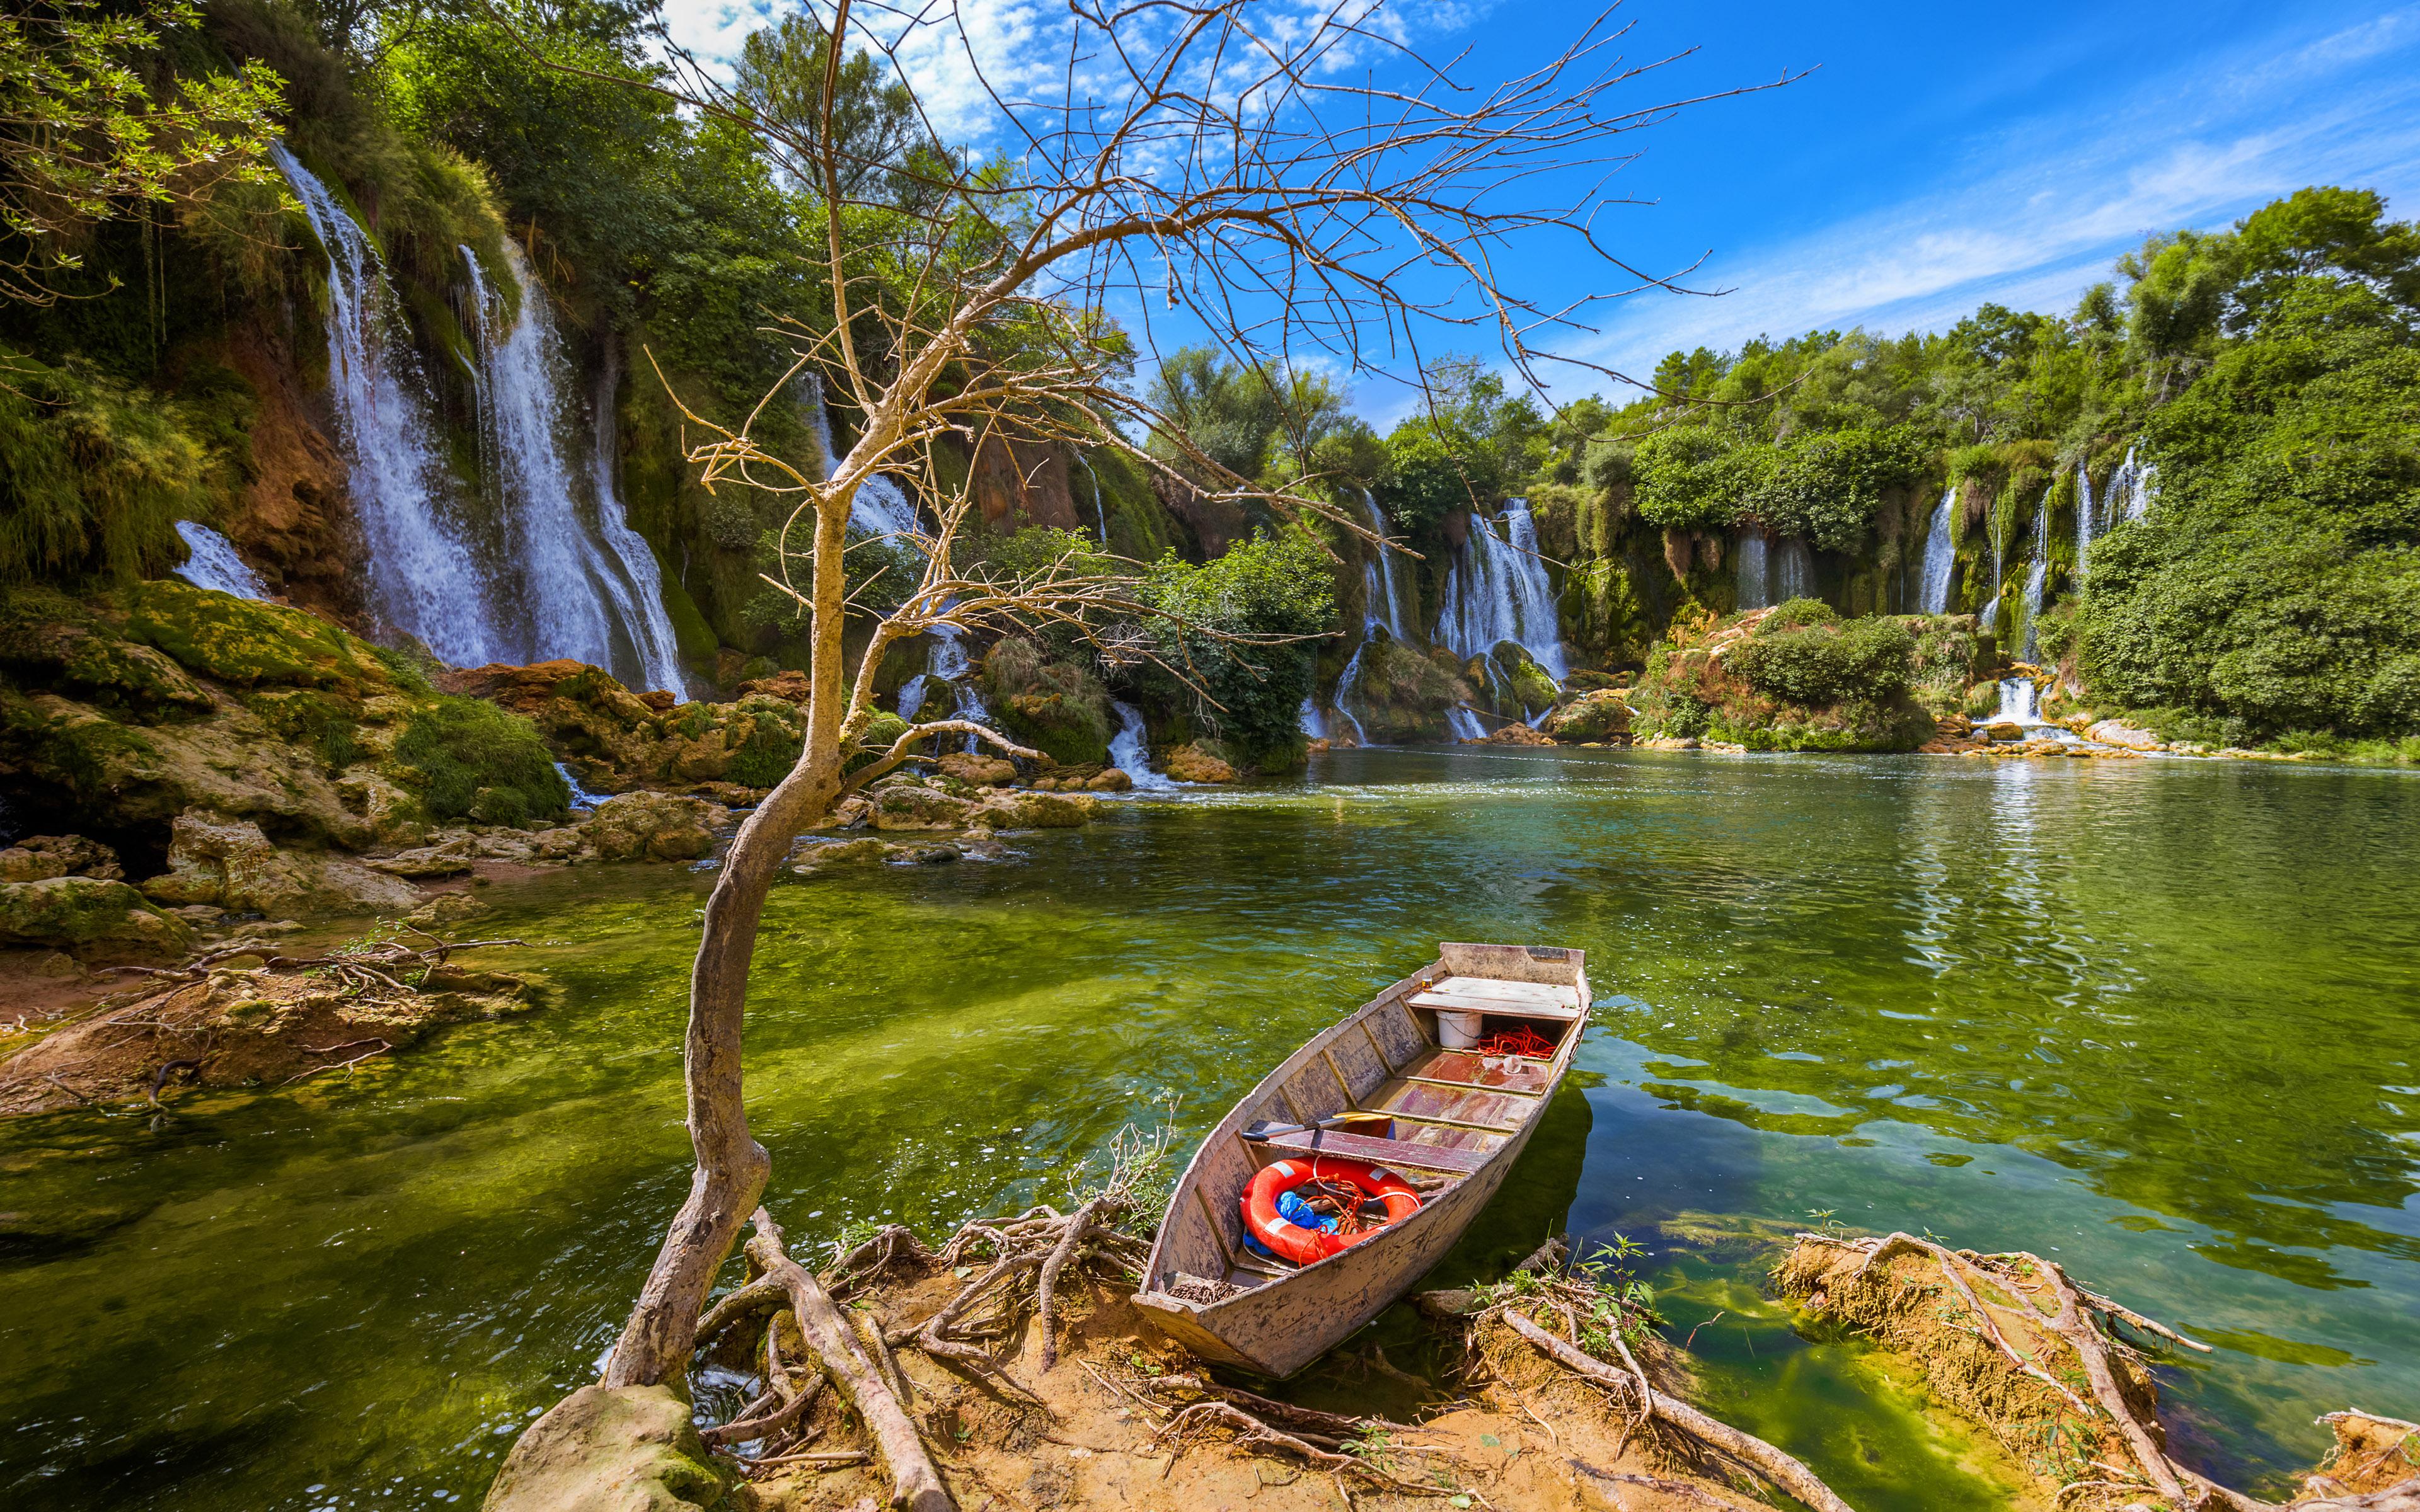 Niagara Falls Wallpaper For Ipad Waterfall Kravice In Bosnia And Herzegovina Beautiful